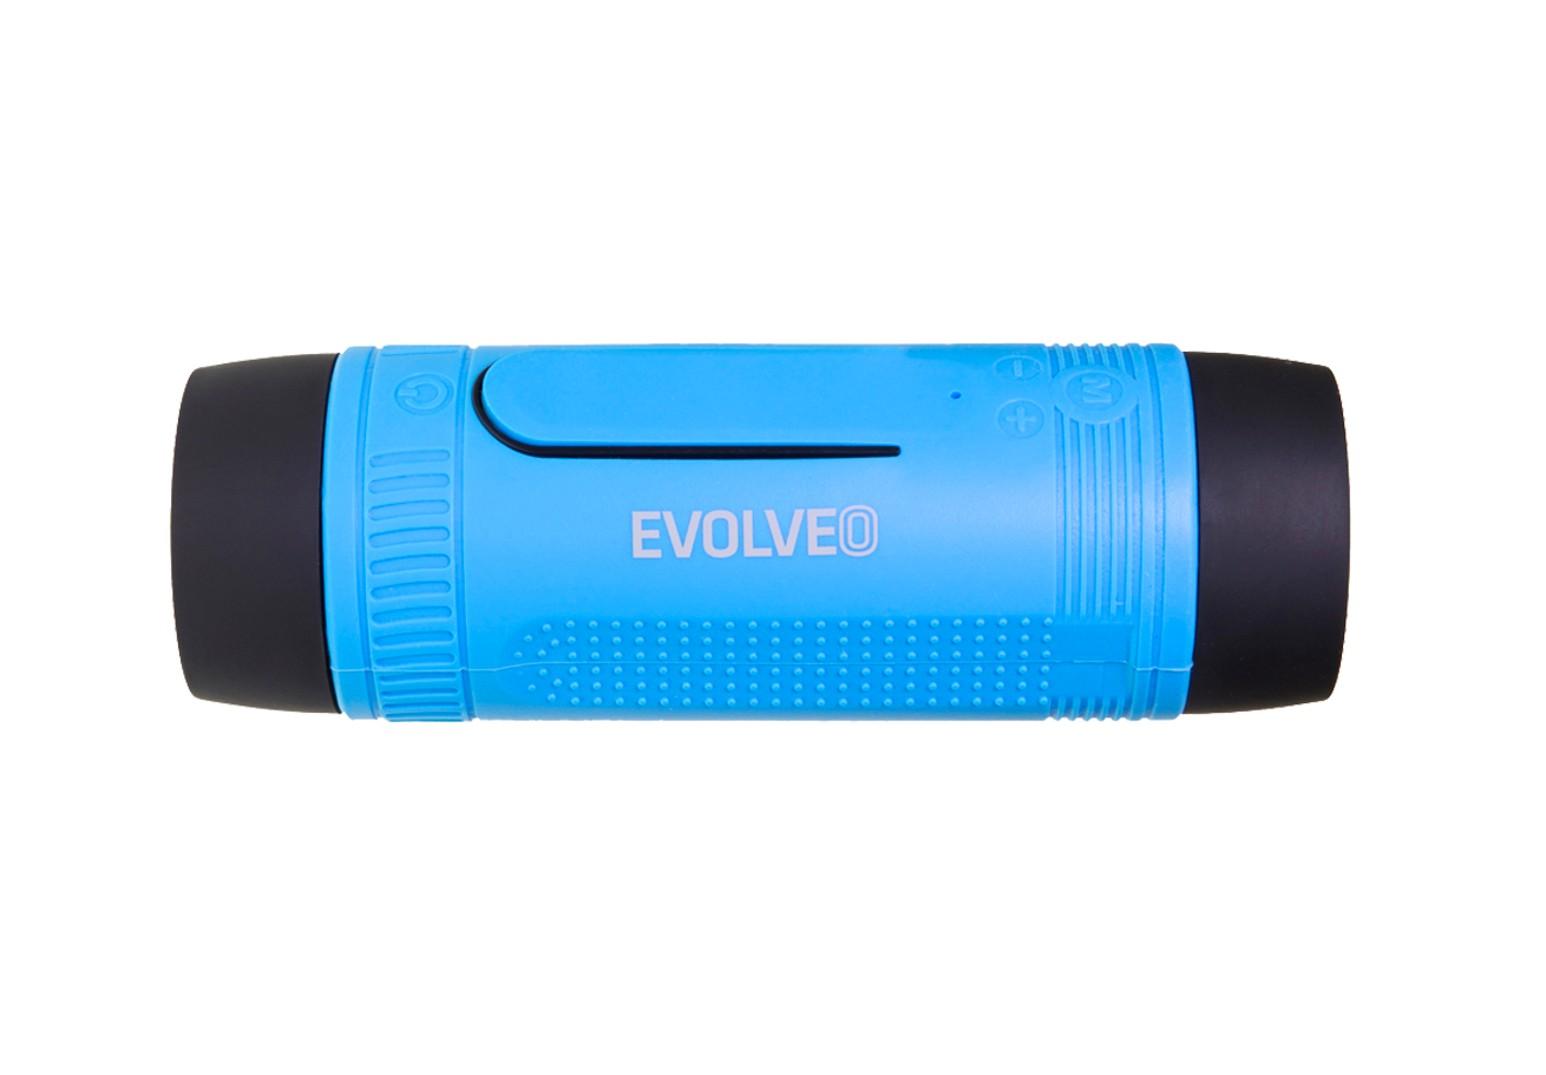 EVOLVEO Armor XL2, outdoorový Bluetooth reproduktor a MP3 přehrávač, BT4.0, LED svítilna, Modrý